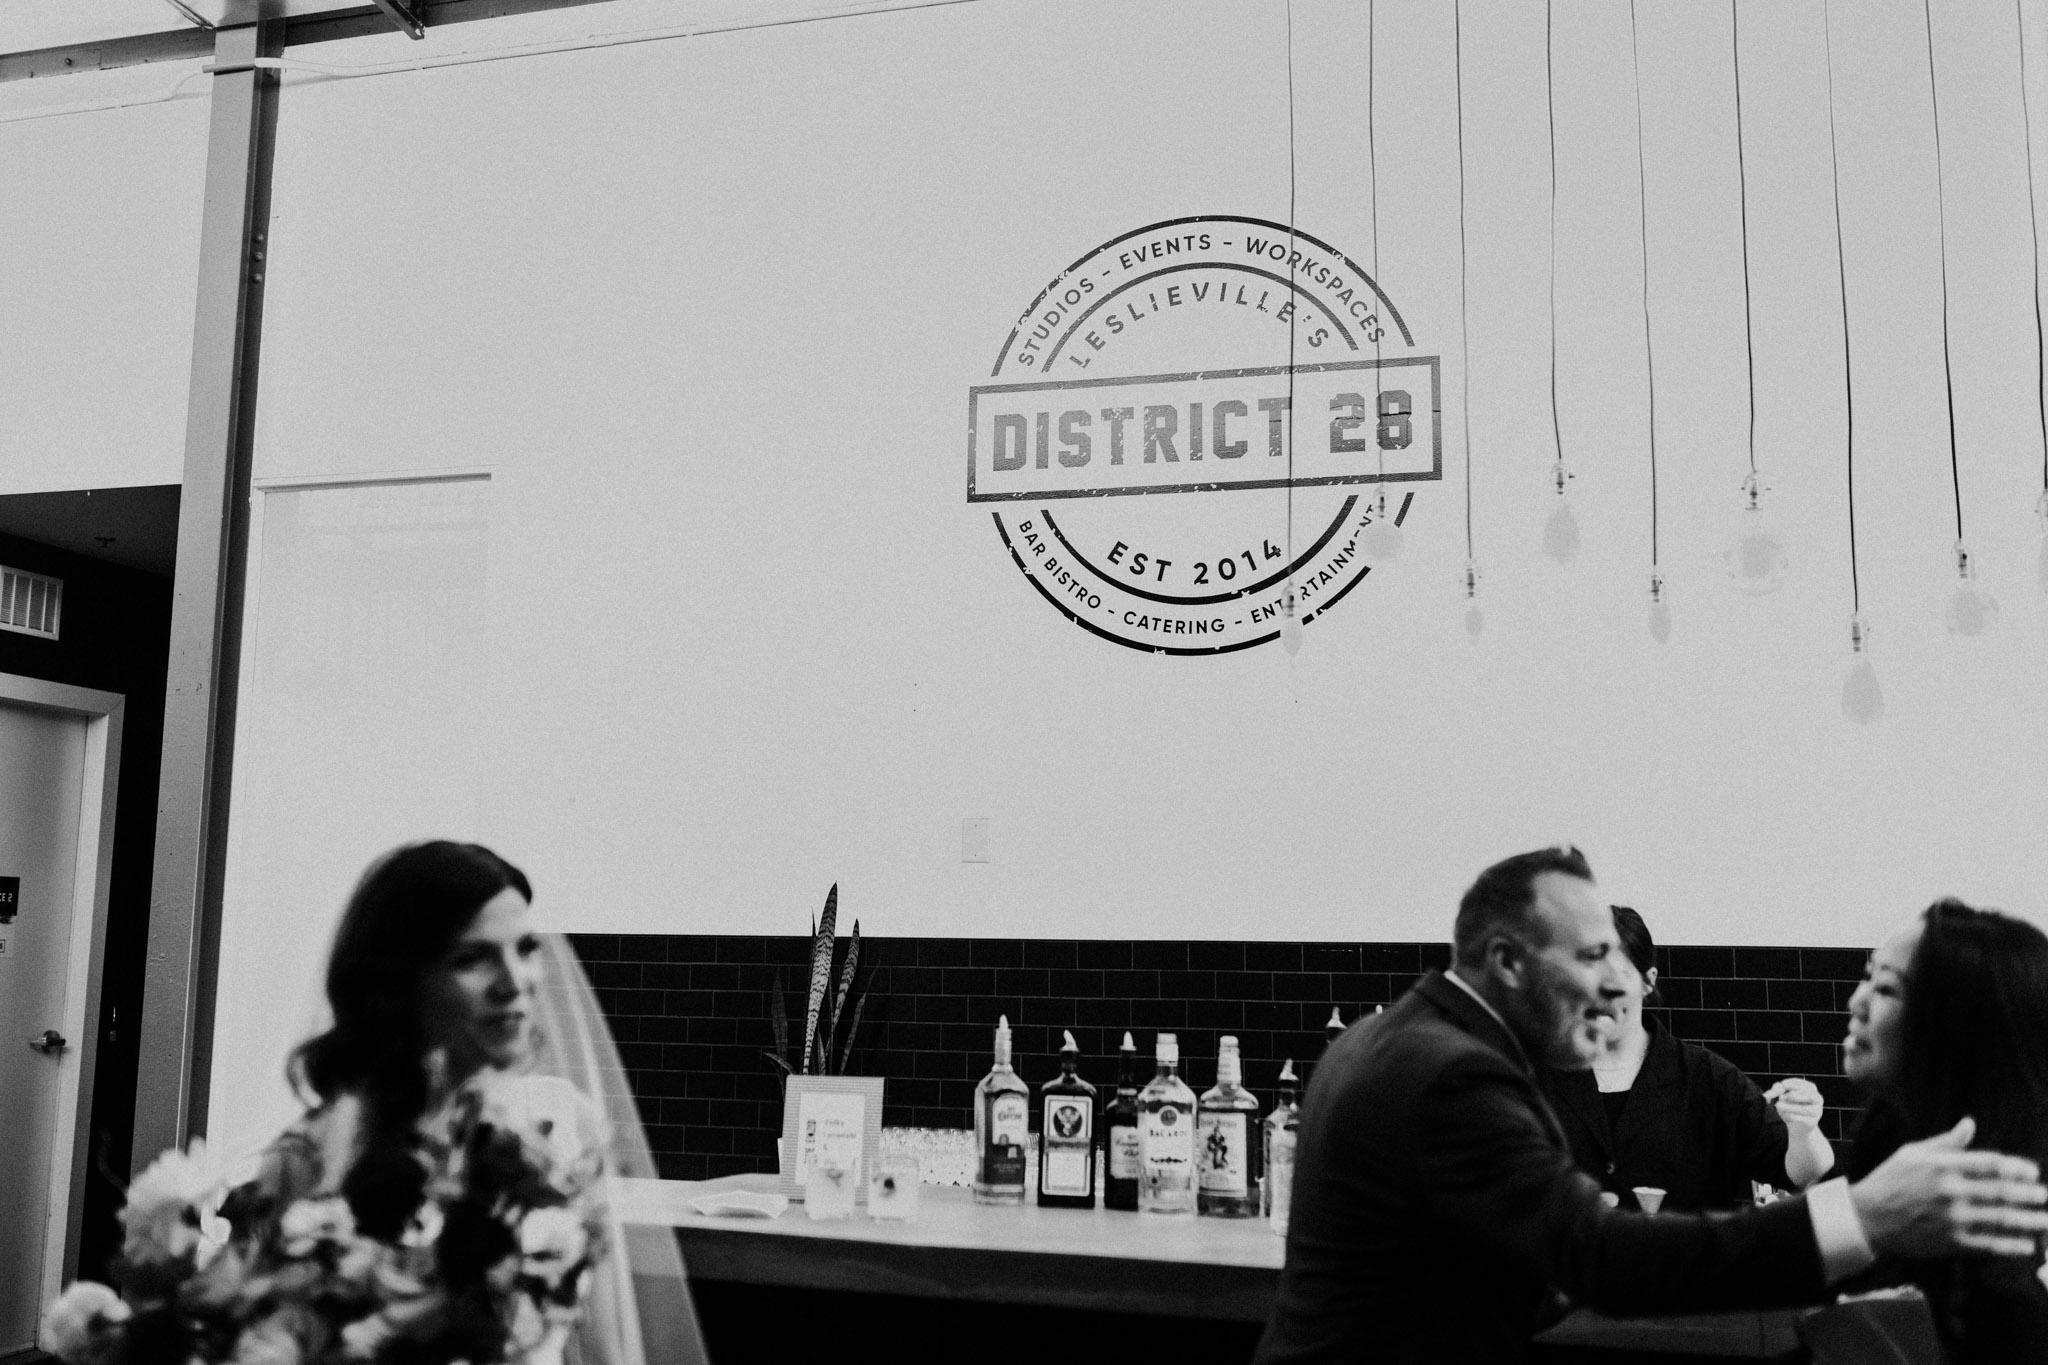 District 28 Wedding Toronto - Bride & groom at bar